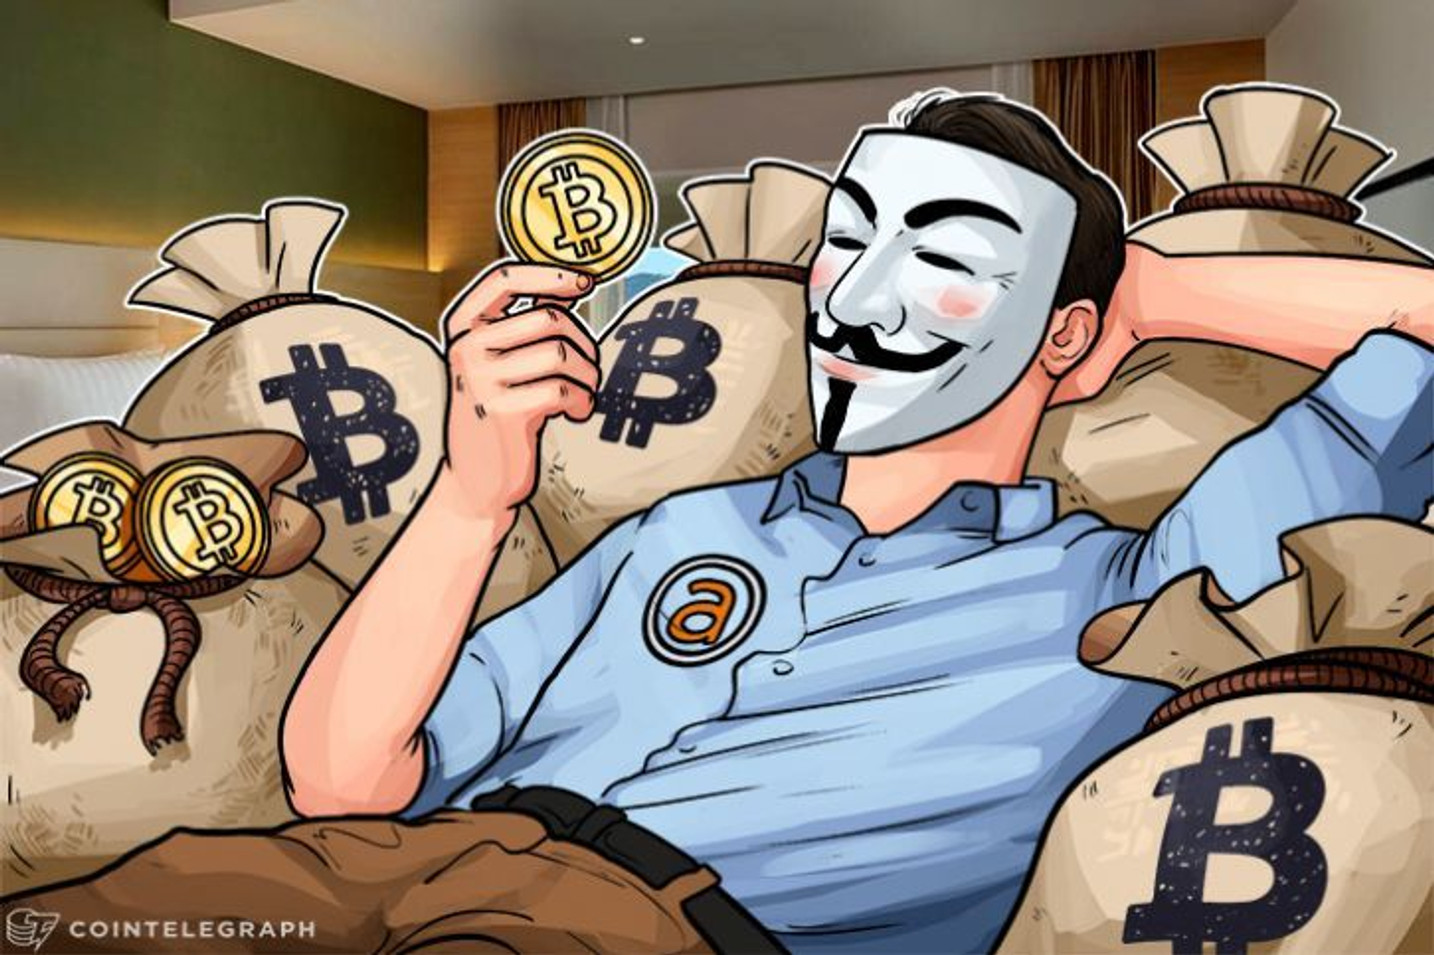 Canada's York Regional Police Warn Against Bitcoin Tax Scam